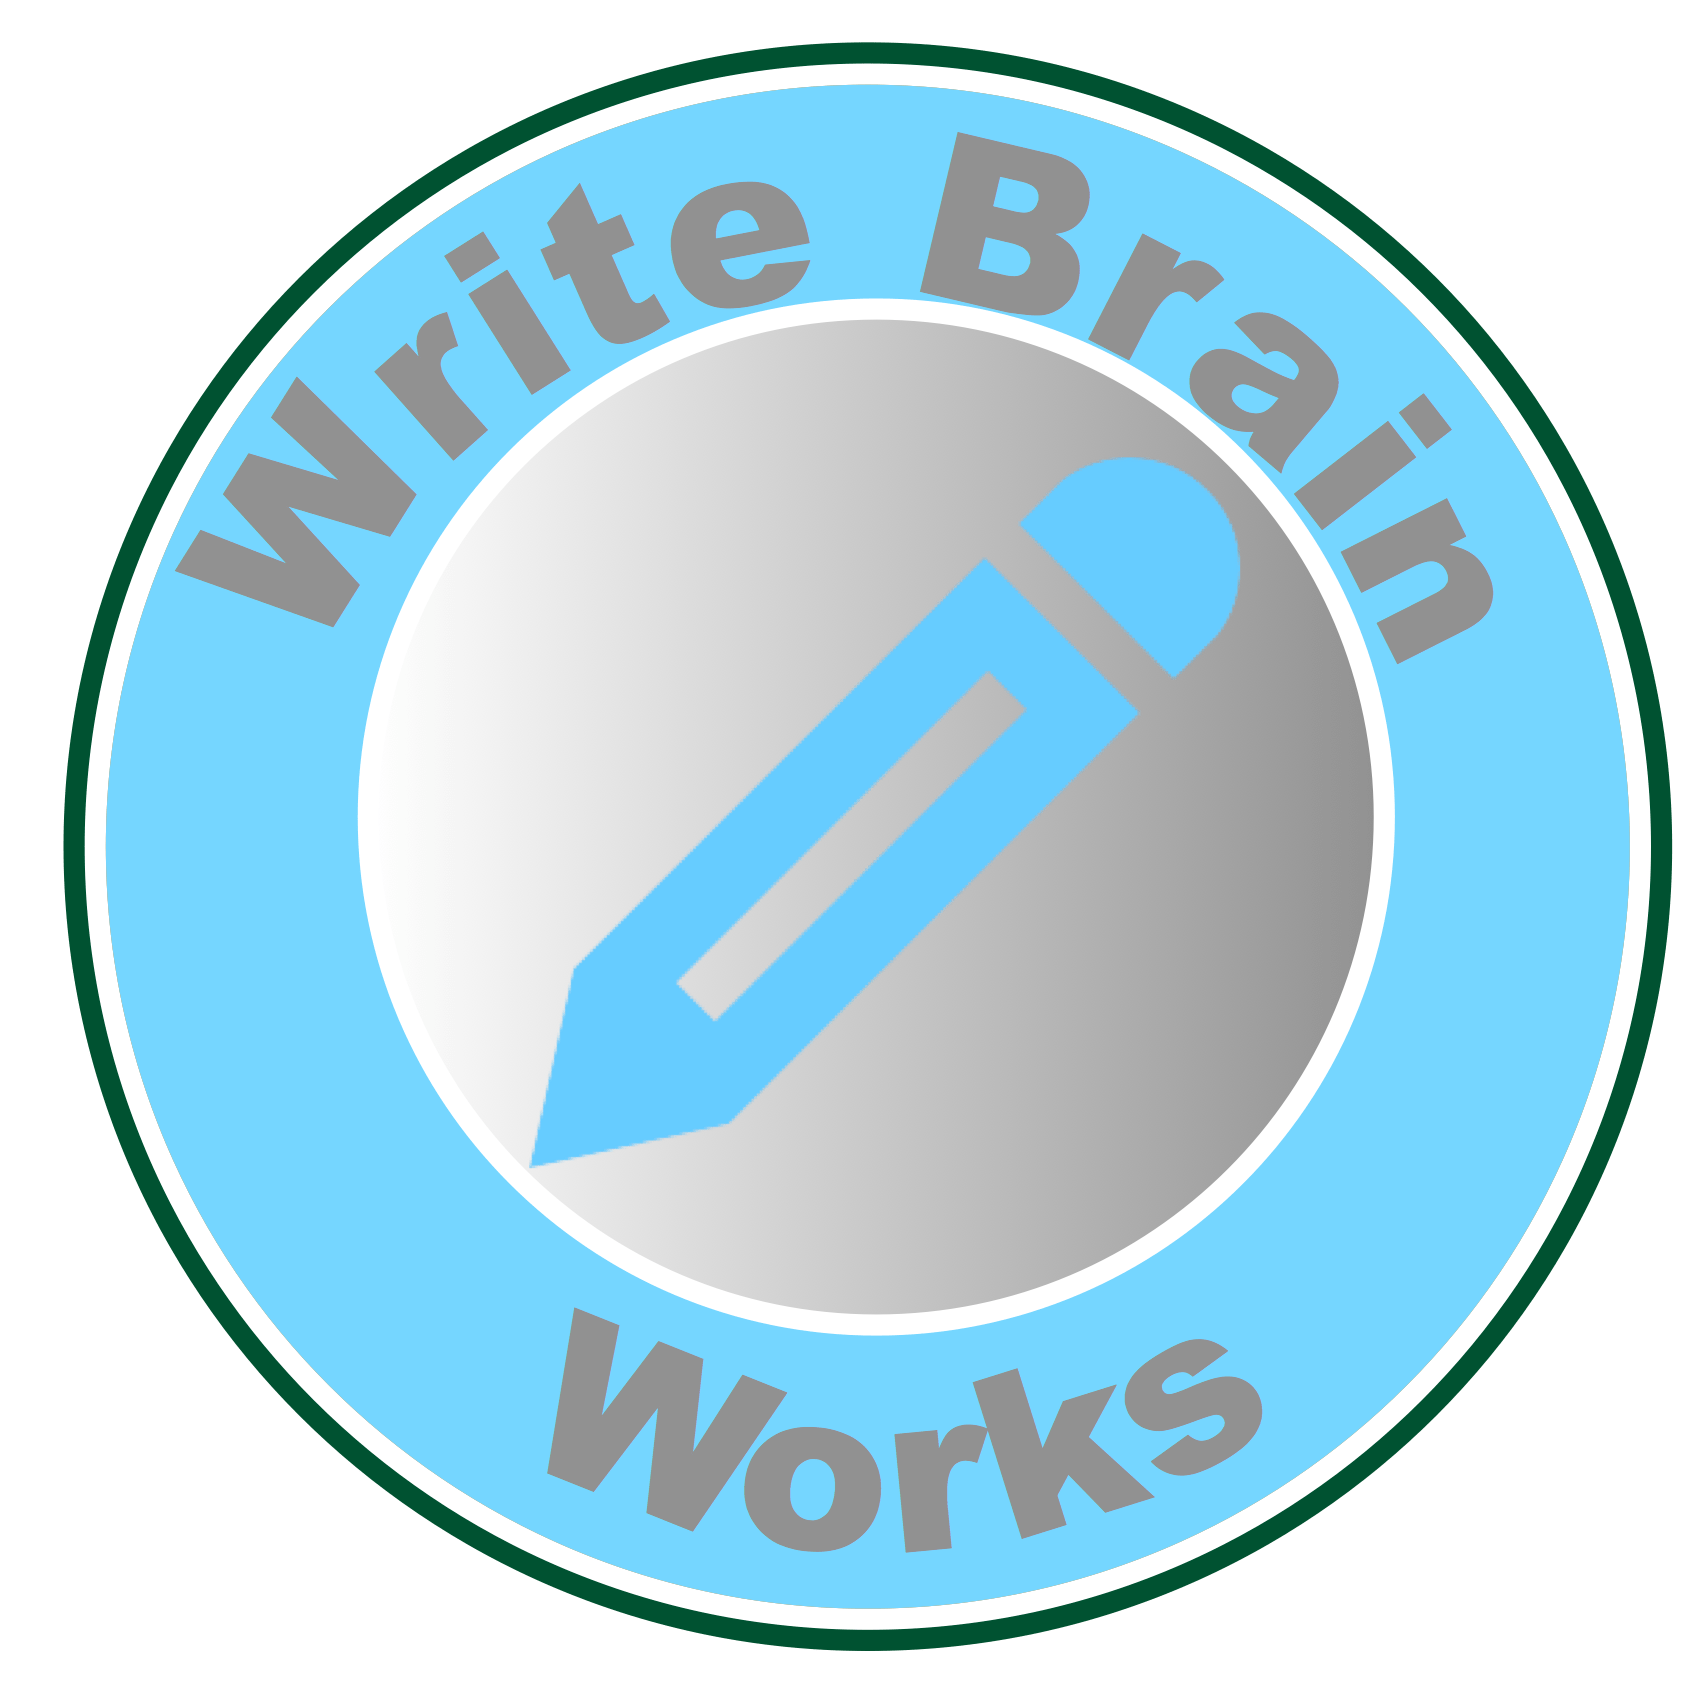 Taste Clipart Action Word Taste Action Word Transparent